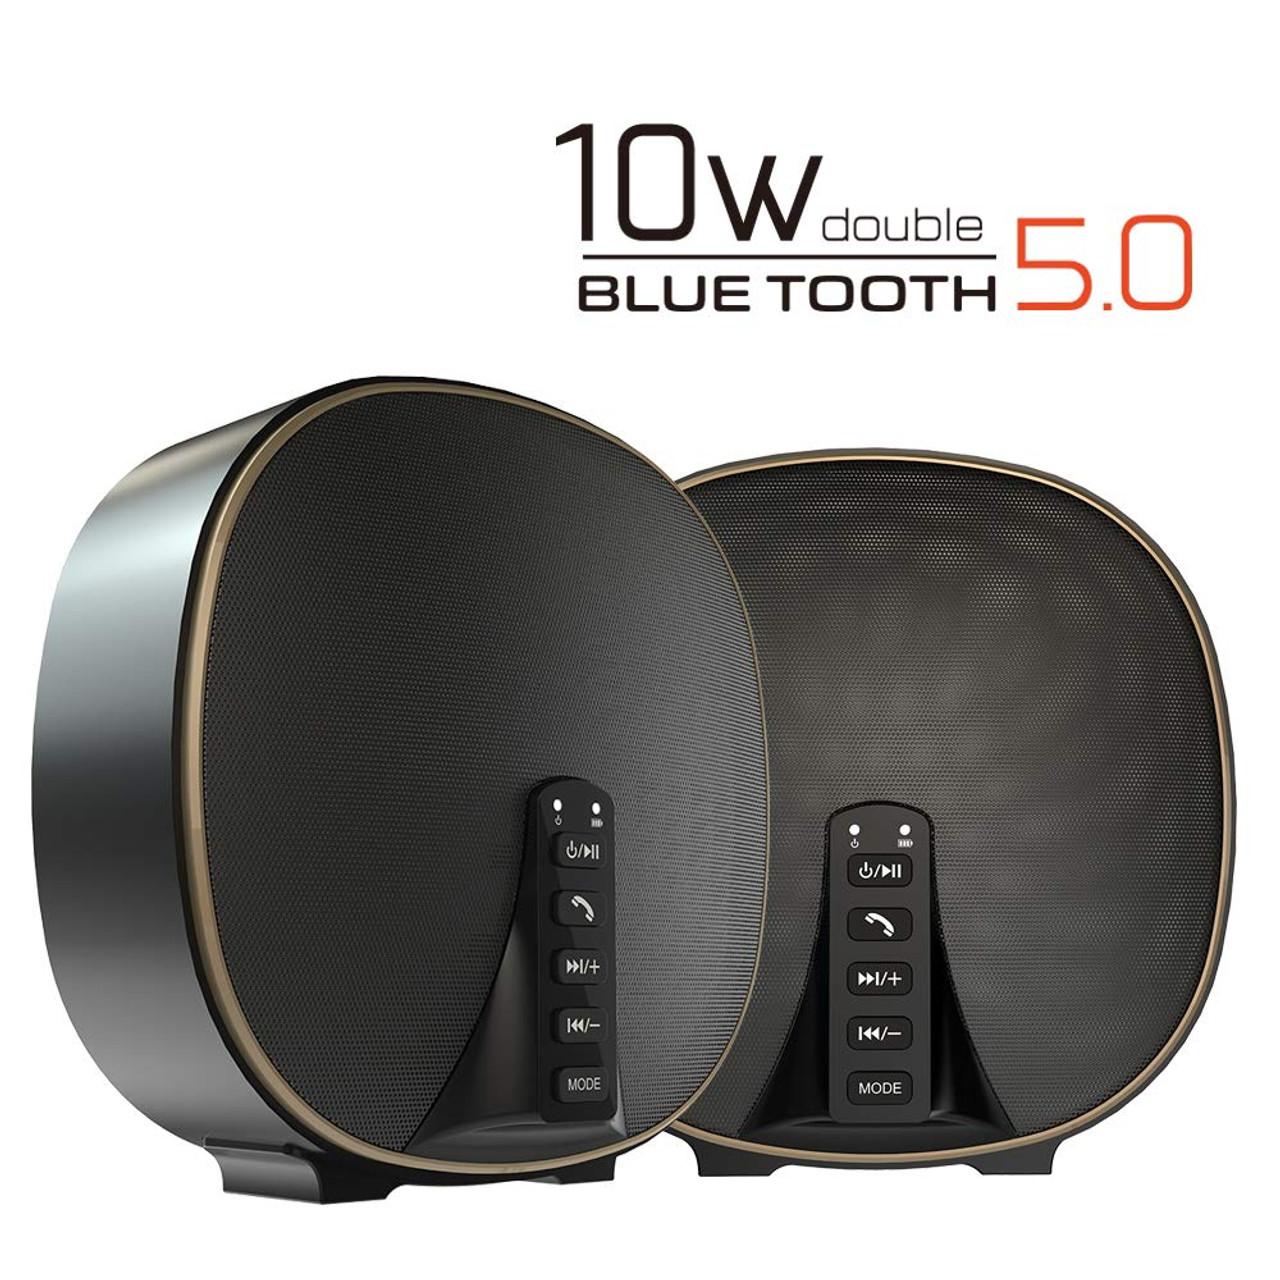 Aspor Bluetooth Speakers Tws Twin Portable Outdoor Wireless Speakers Ayoub Computers